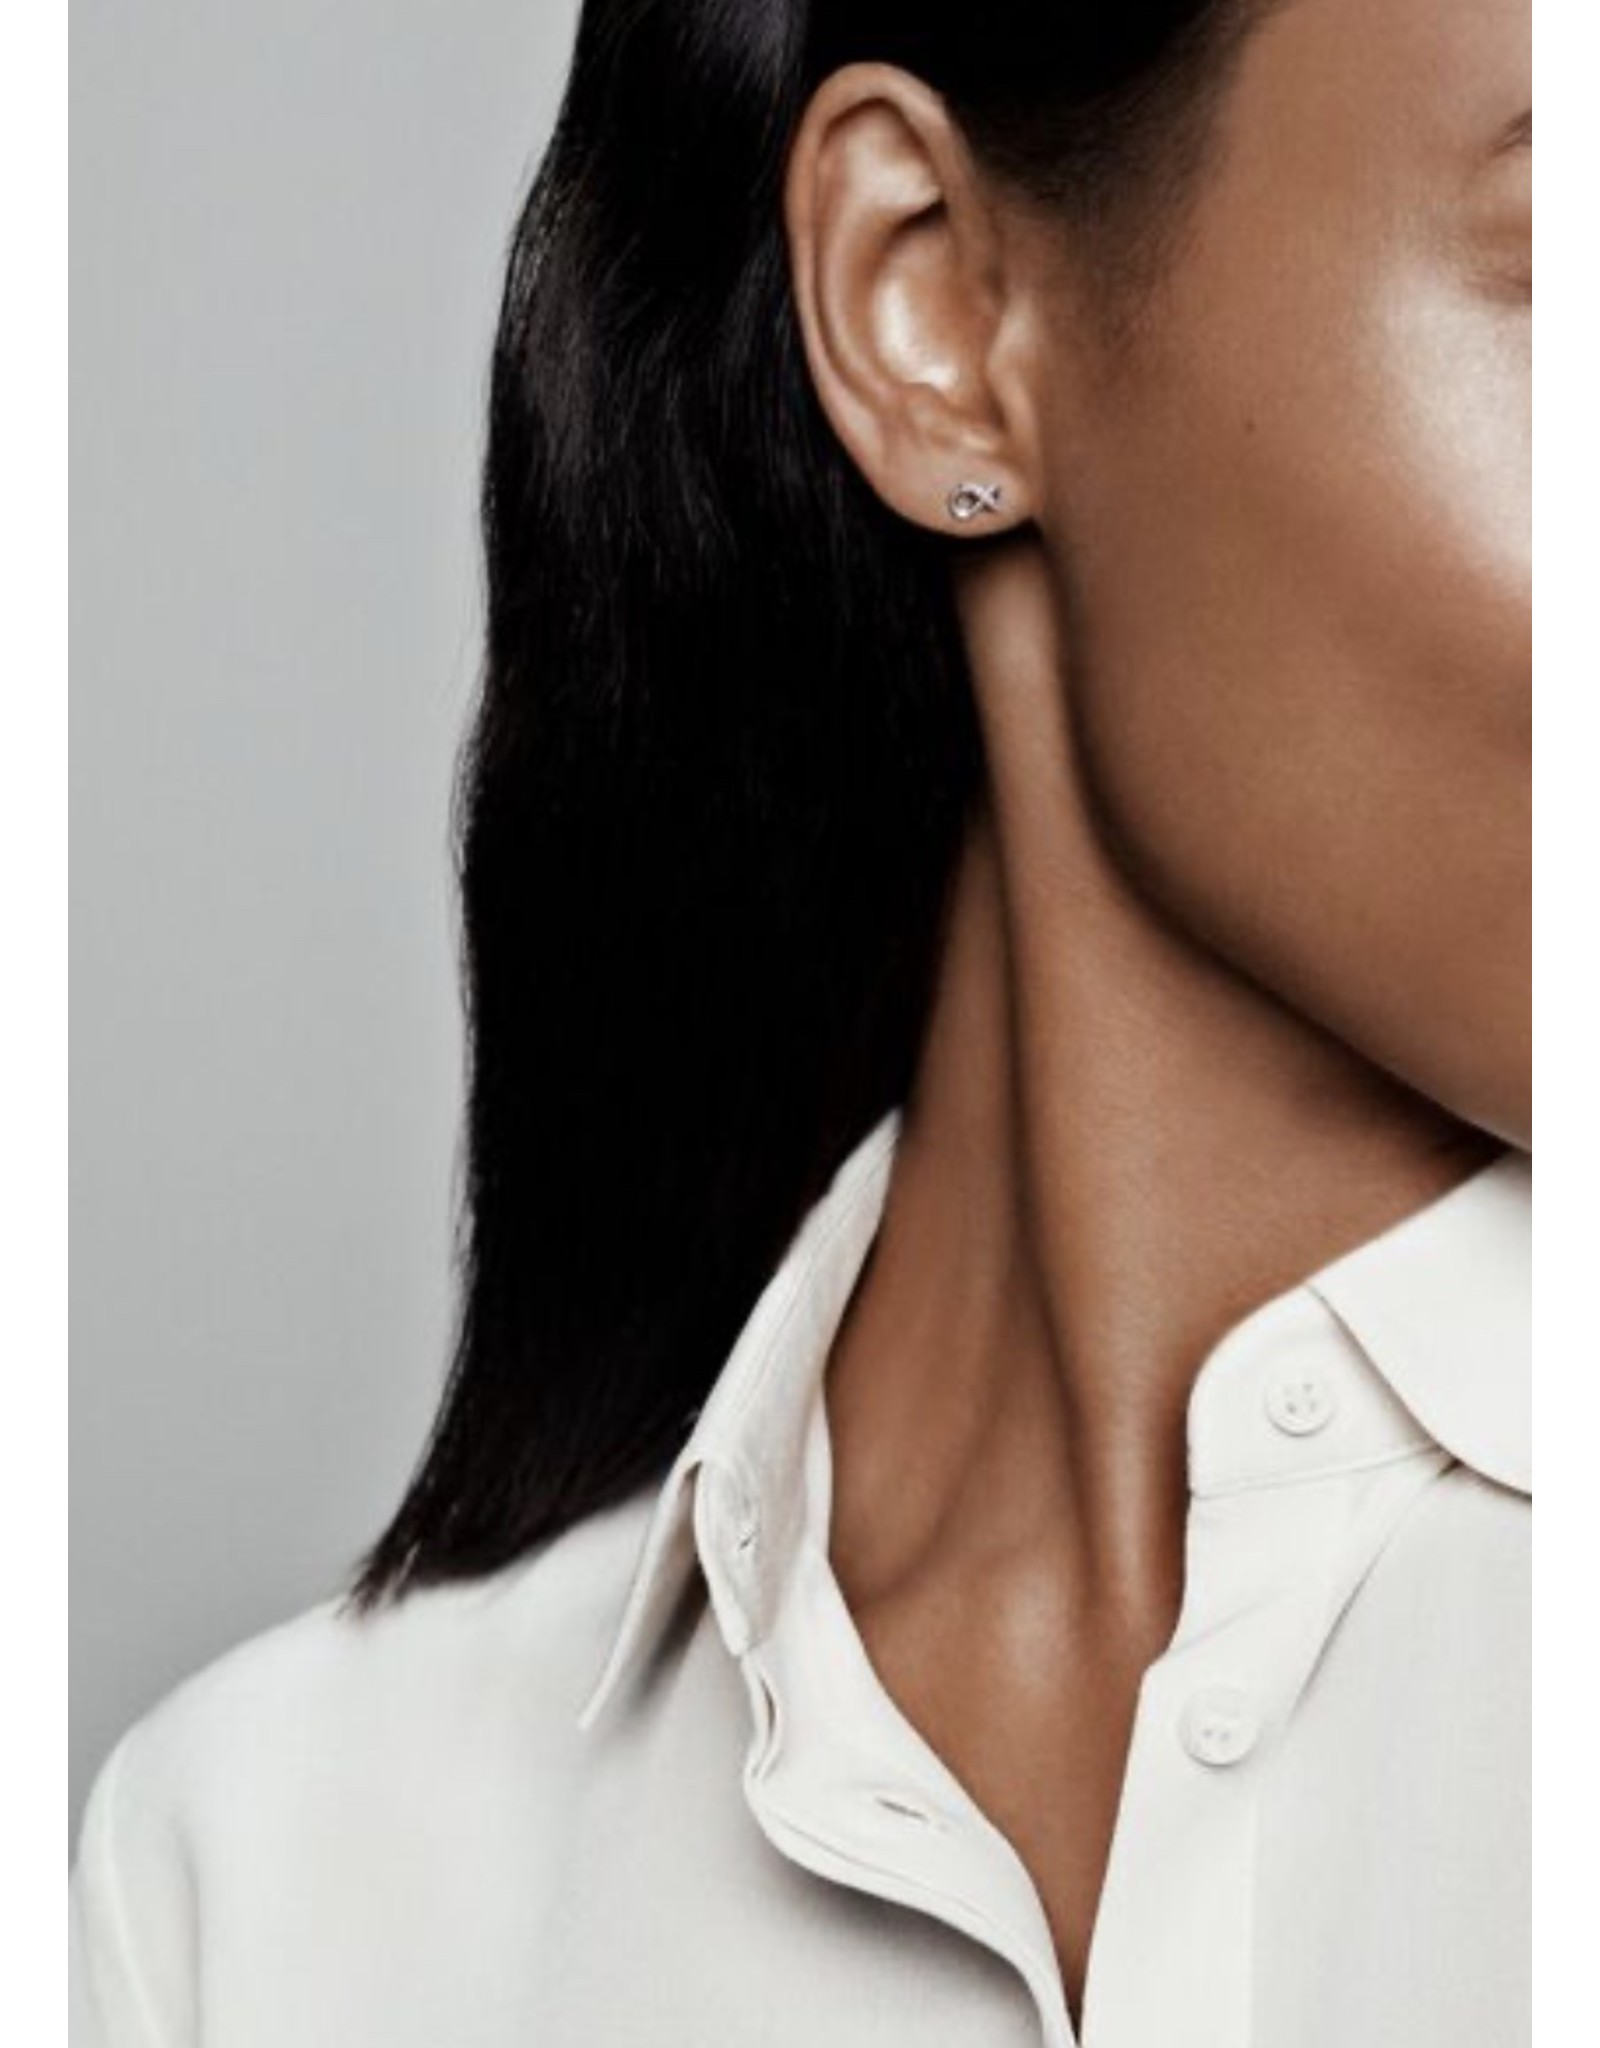 Pandora Pandora Earrings,298820C01, Sparkling Infinity Stud, Sterling Silver, CLear CZ